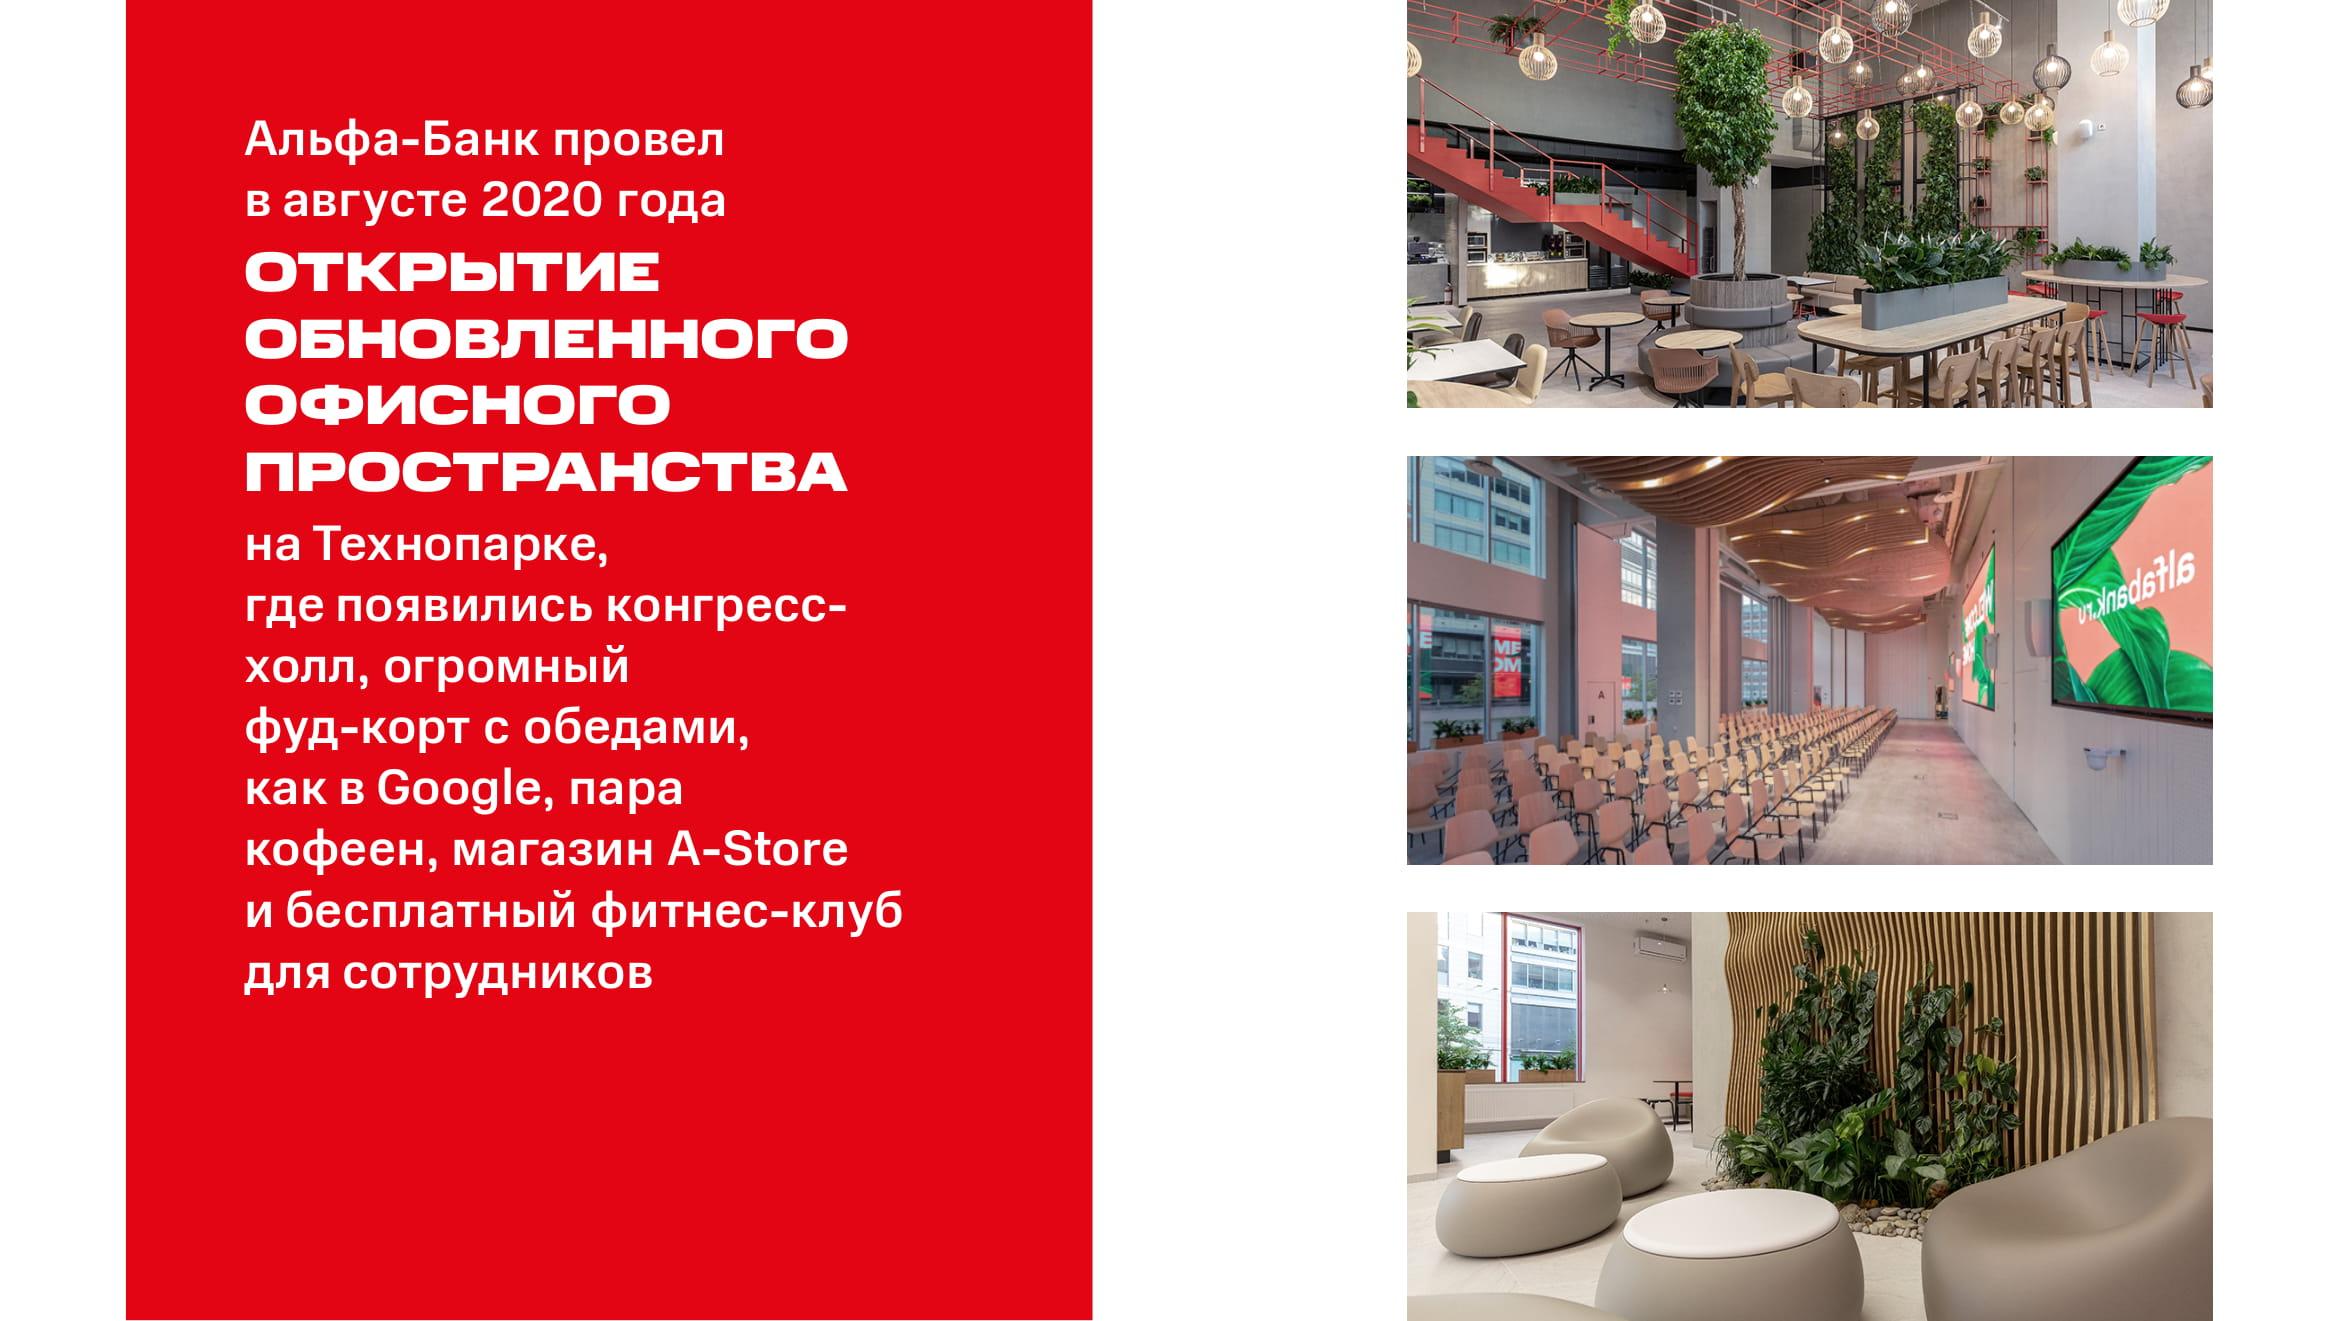 RFA_Креатив-года-2020_МТС-Банк-VS-Альфа-Банк-03